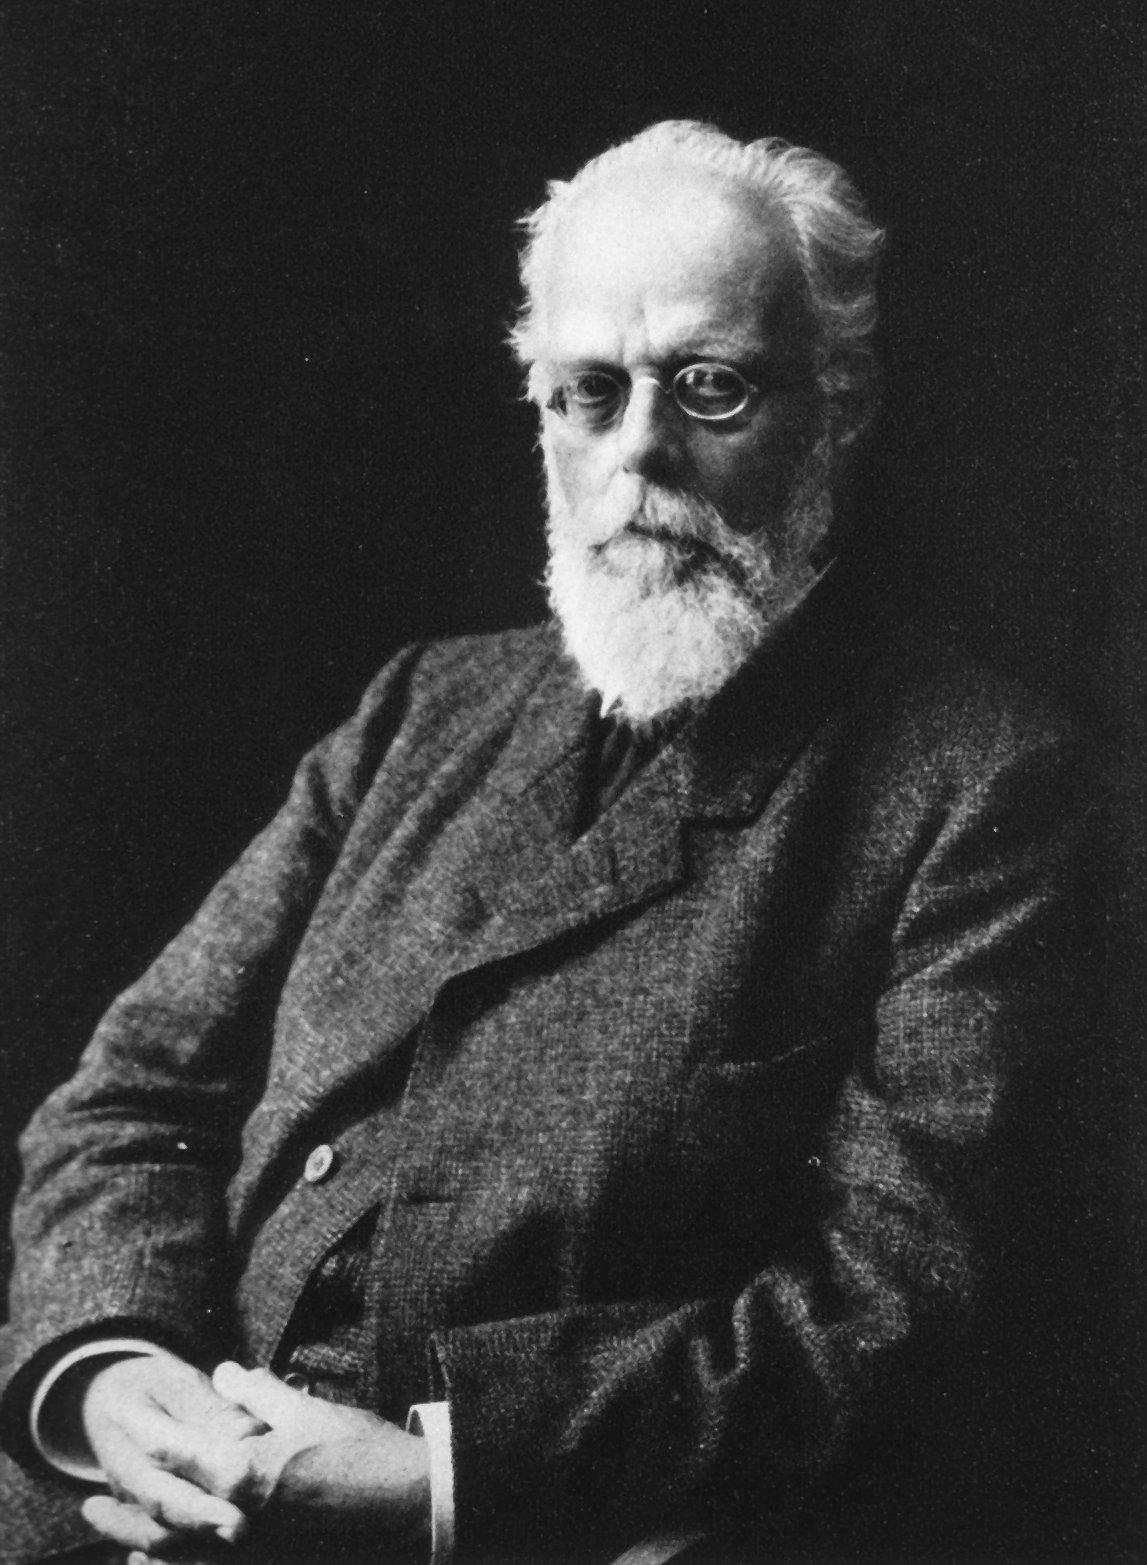 image of August Weismann